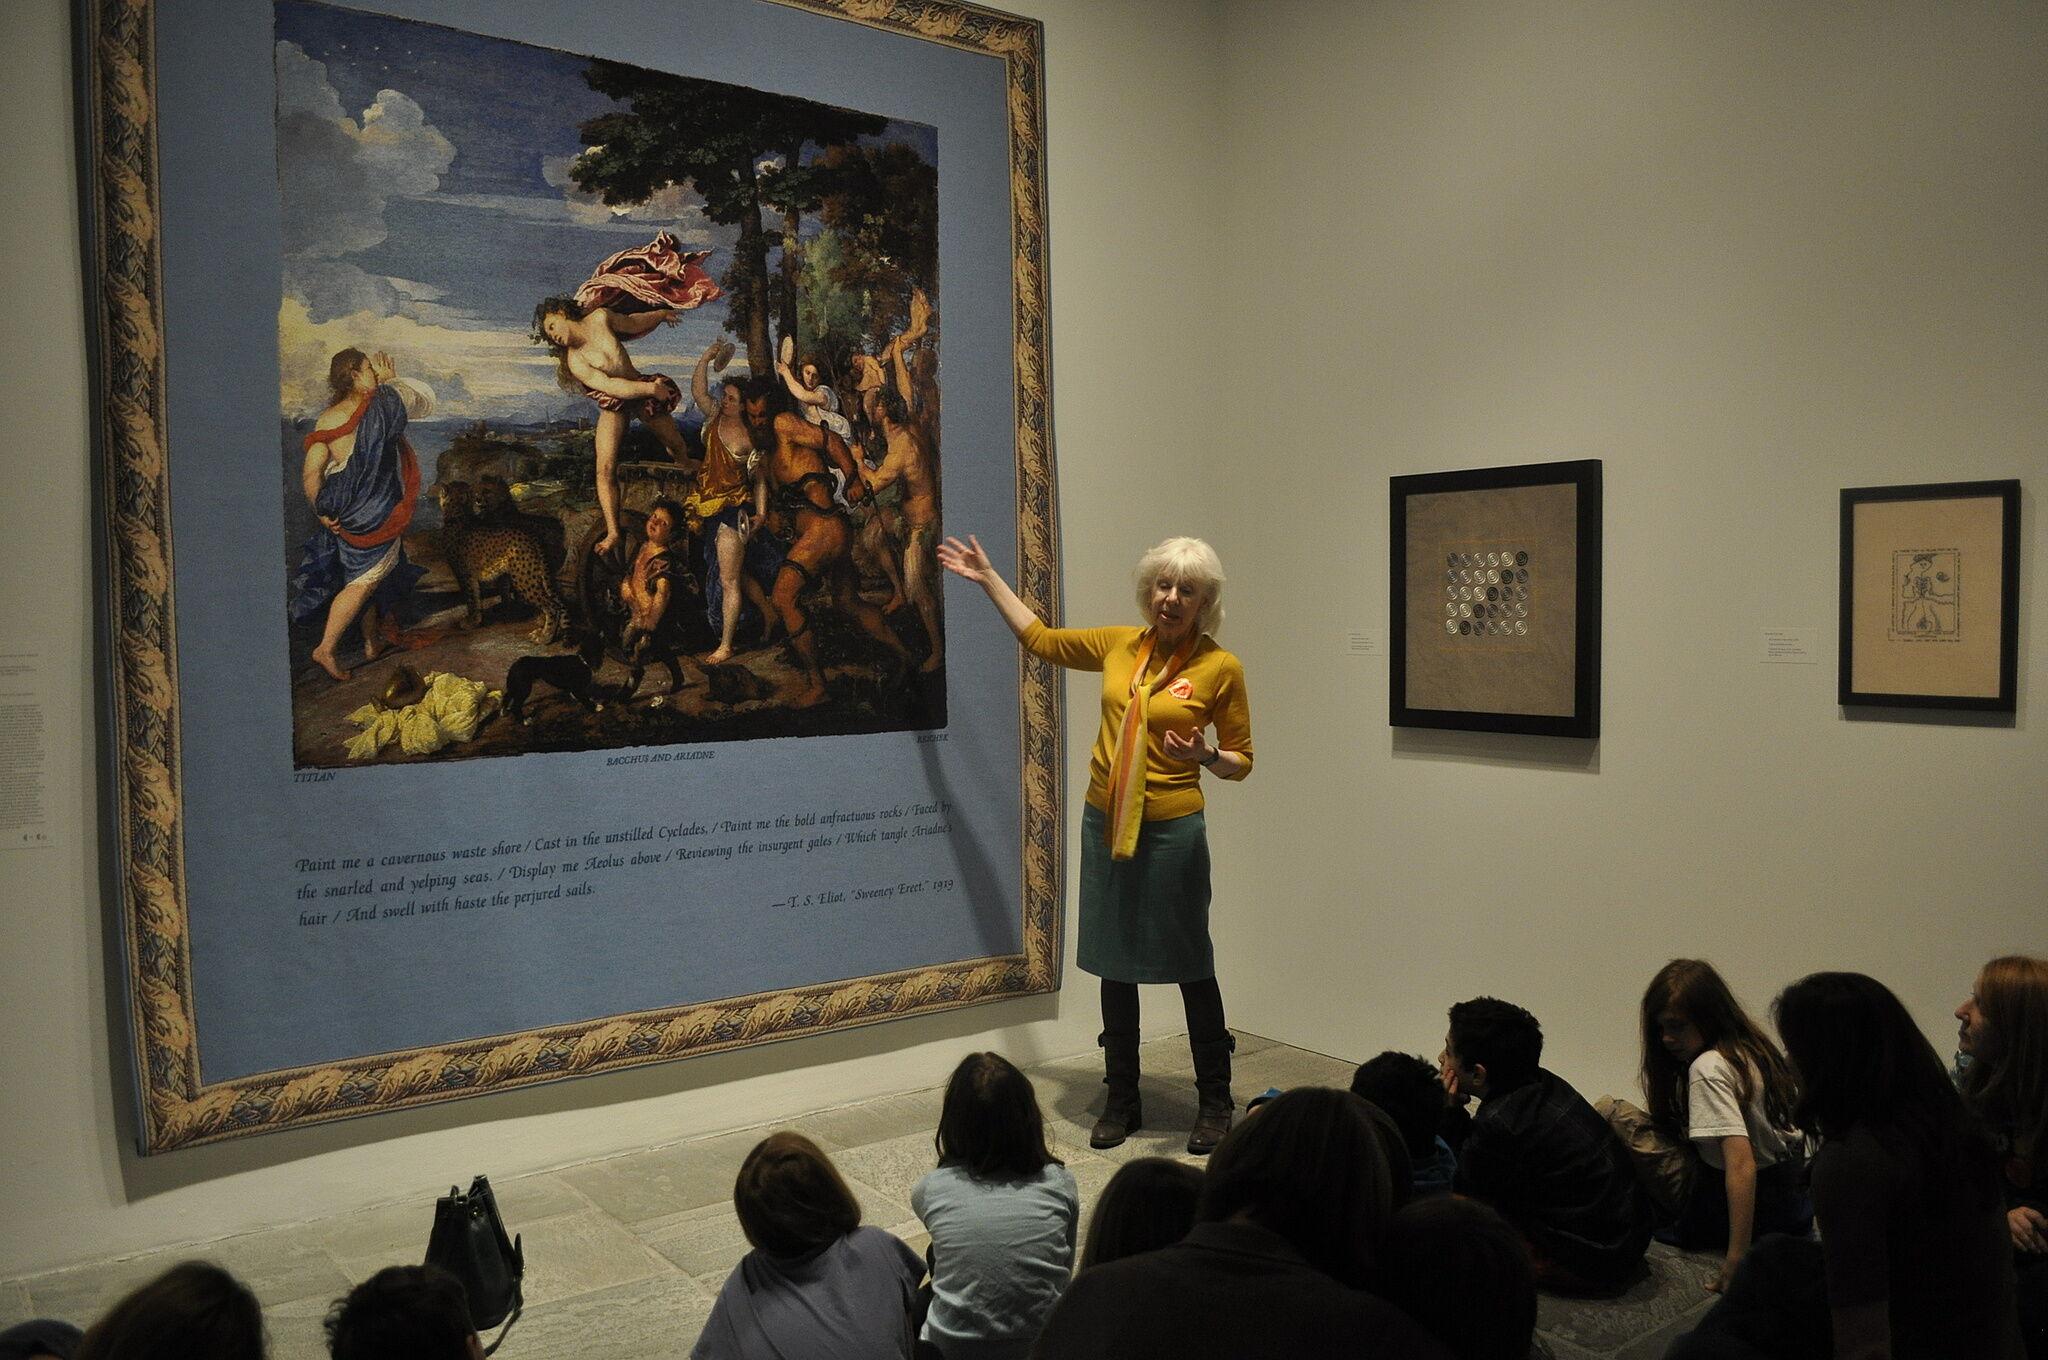 The artist presents her art